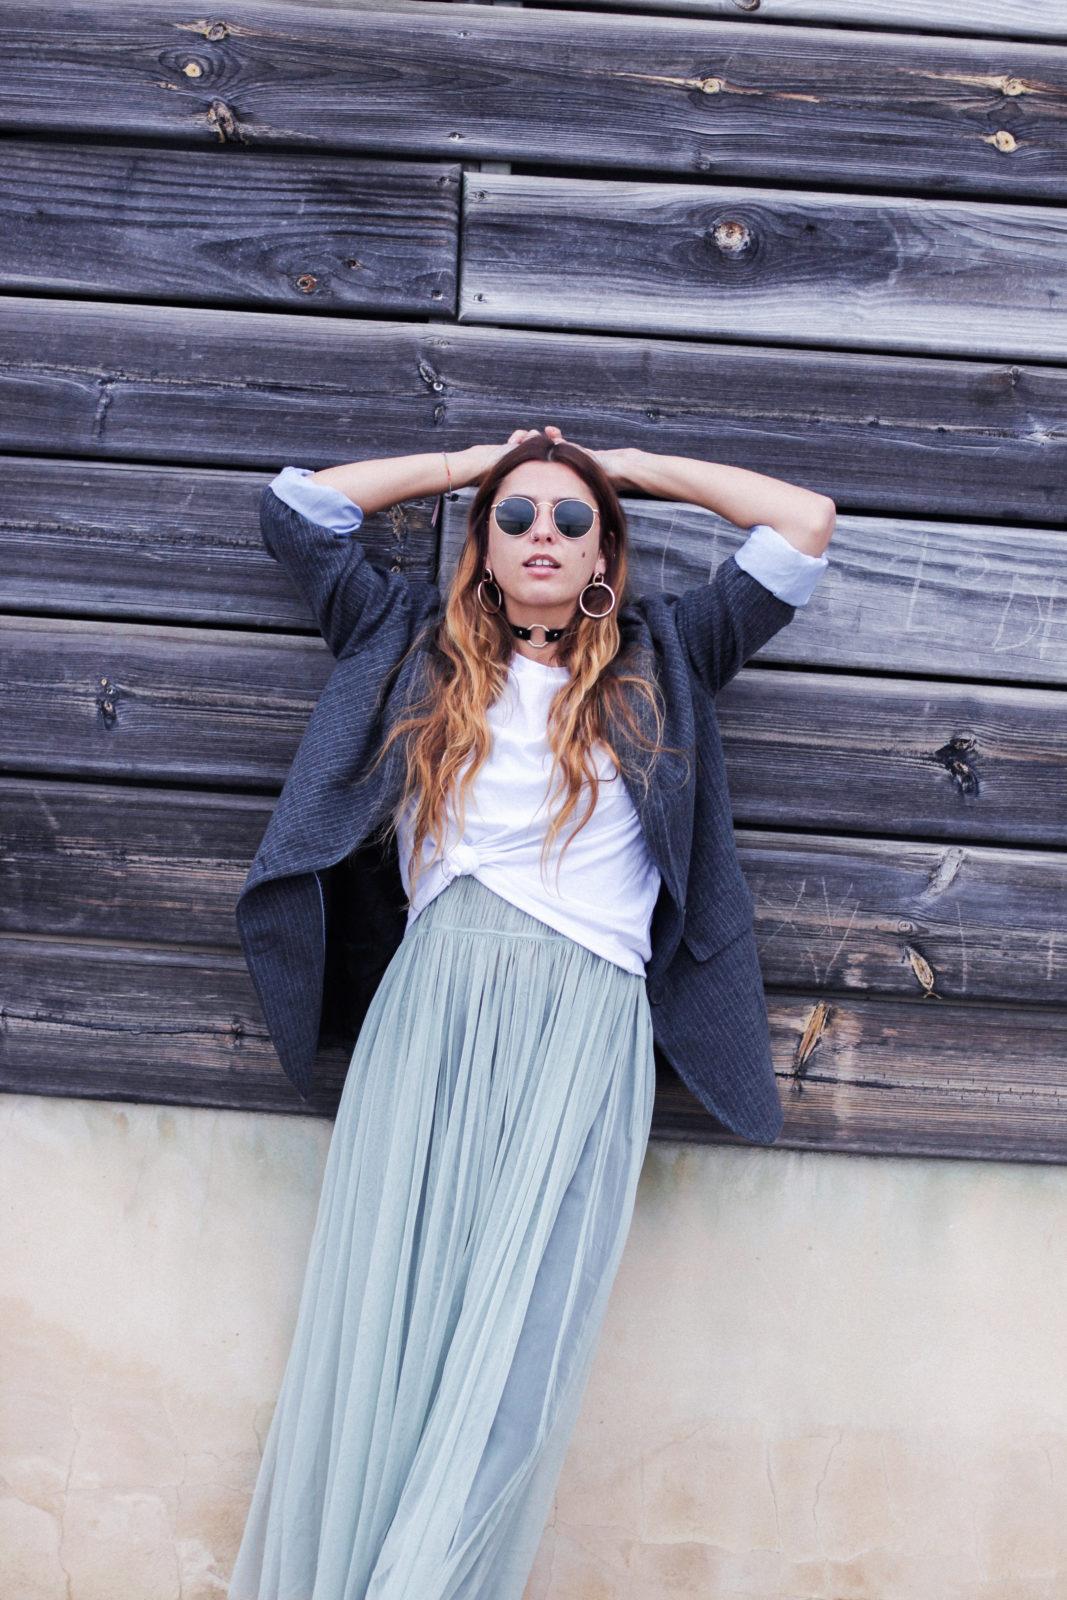 vestido_de_tul_sobre_pantalon_estilo_bailarina_blazer_oversize_pendientes_de_aros_choker_tendencias_trends_fall_2016_street_style_donkeycool-5